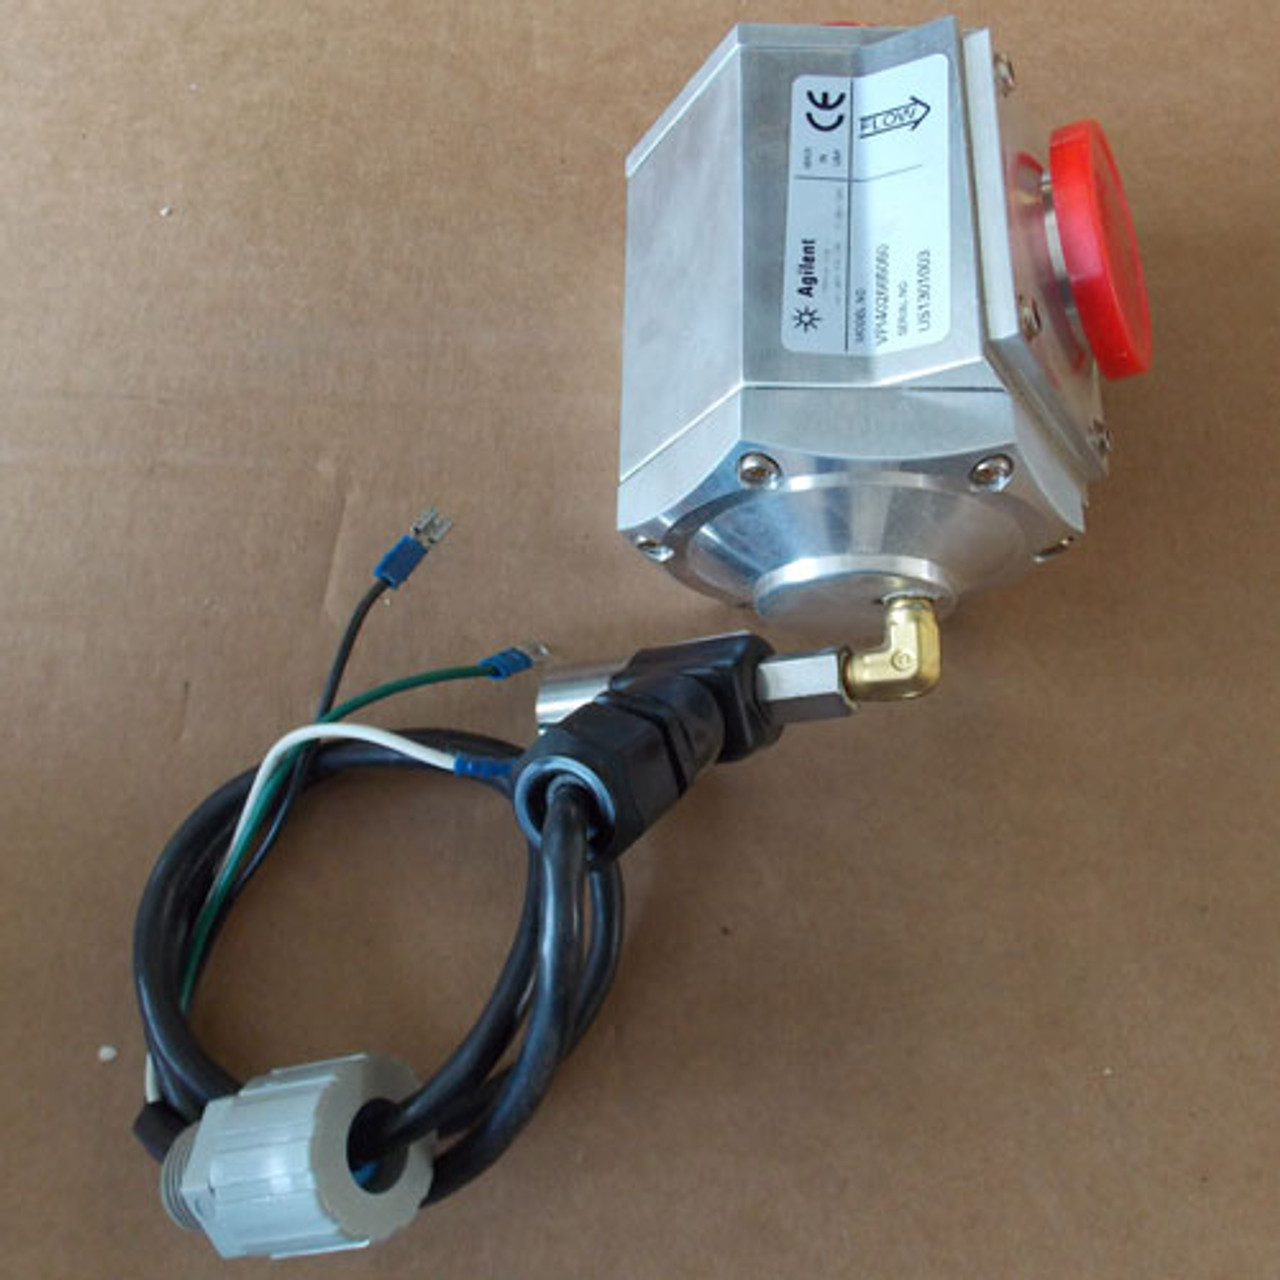 Agilent VPI402665060 Vacuum Pump Isolation Valve 240/266V - New